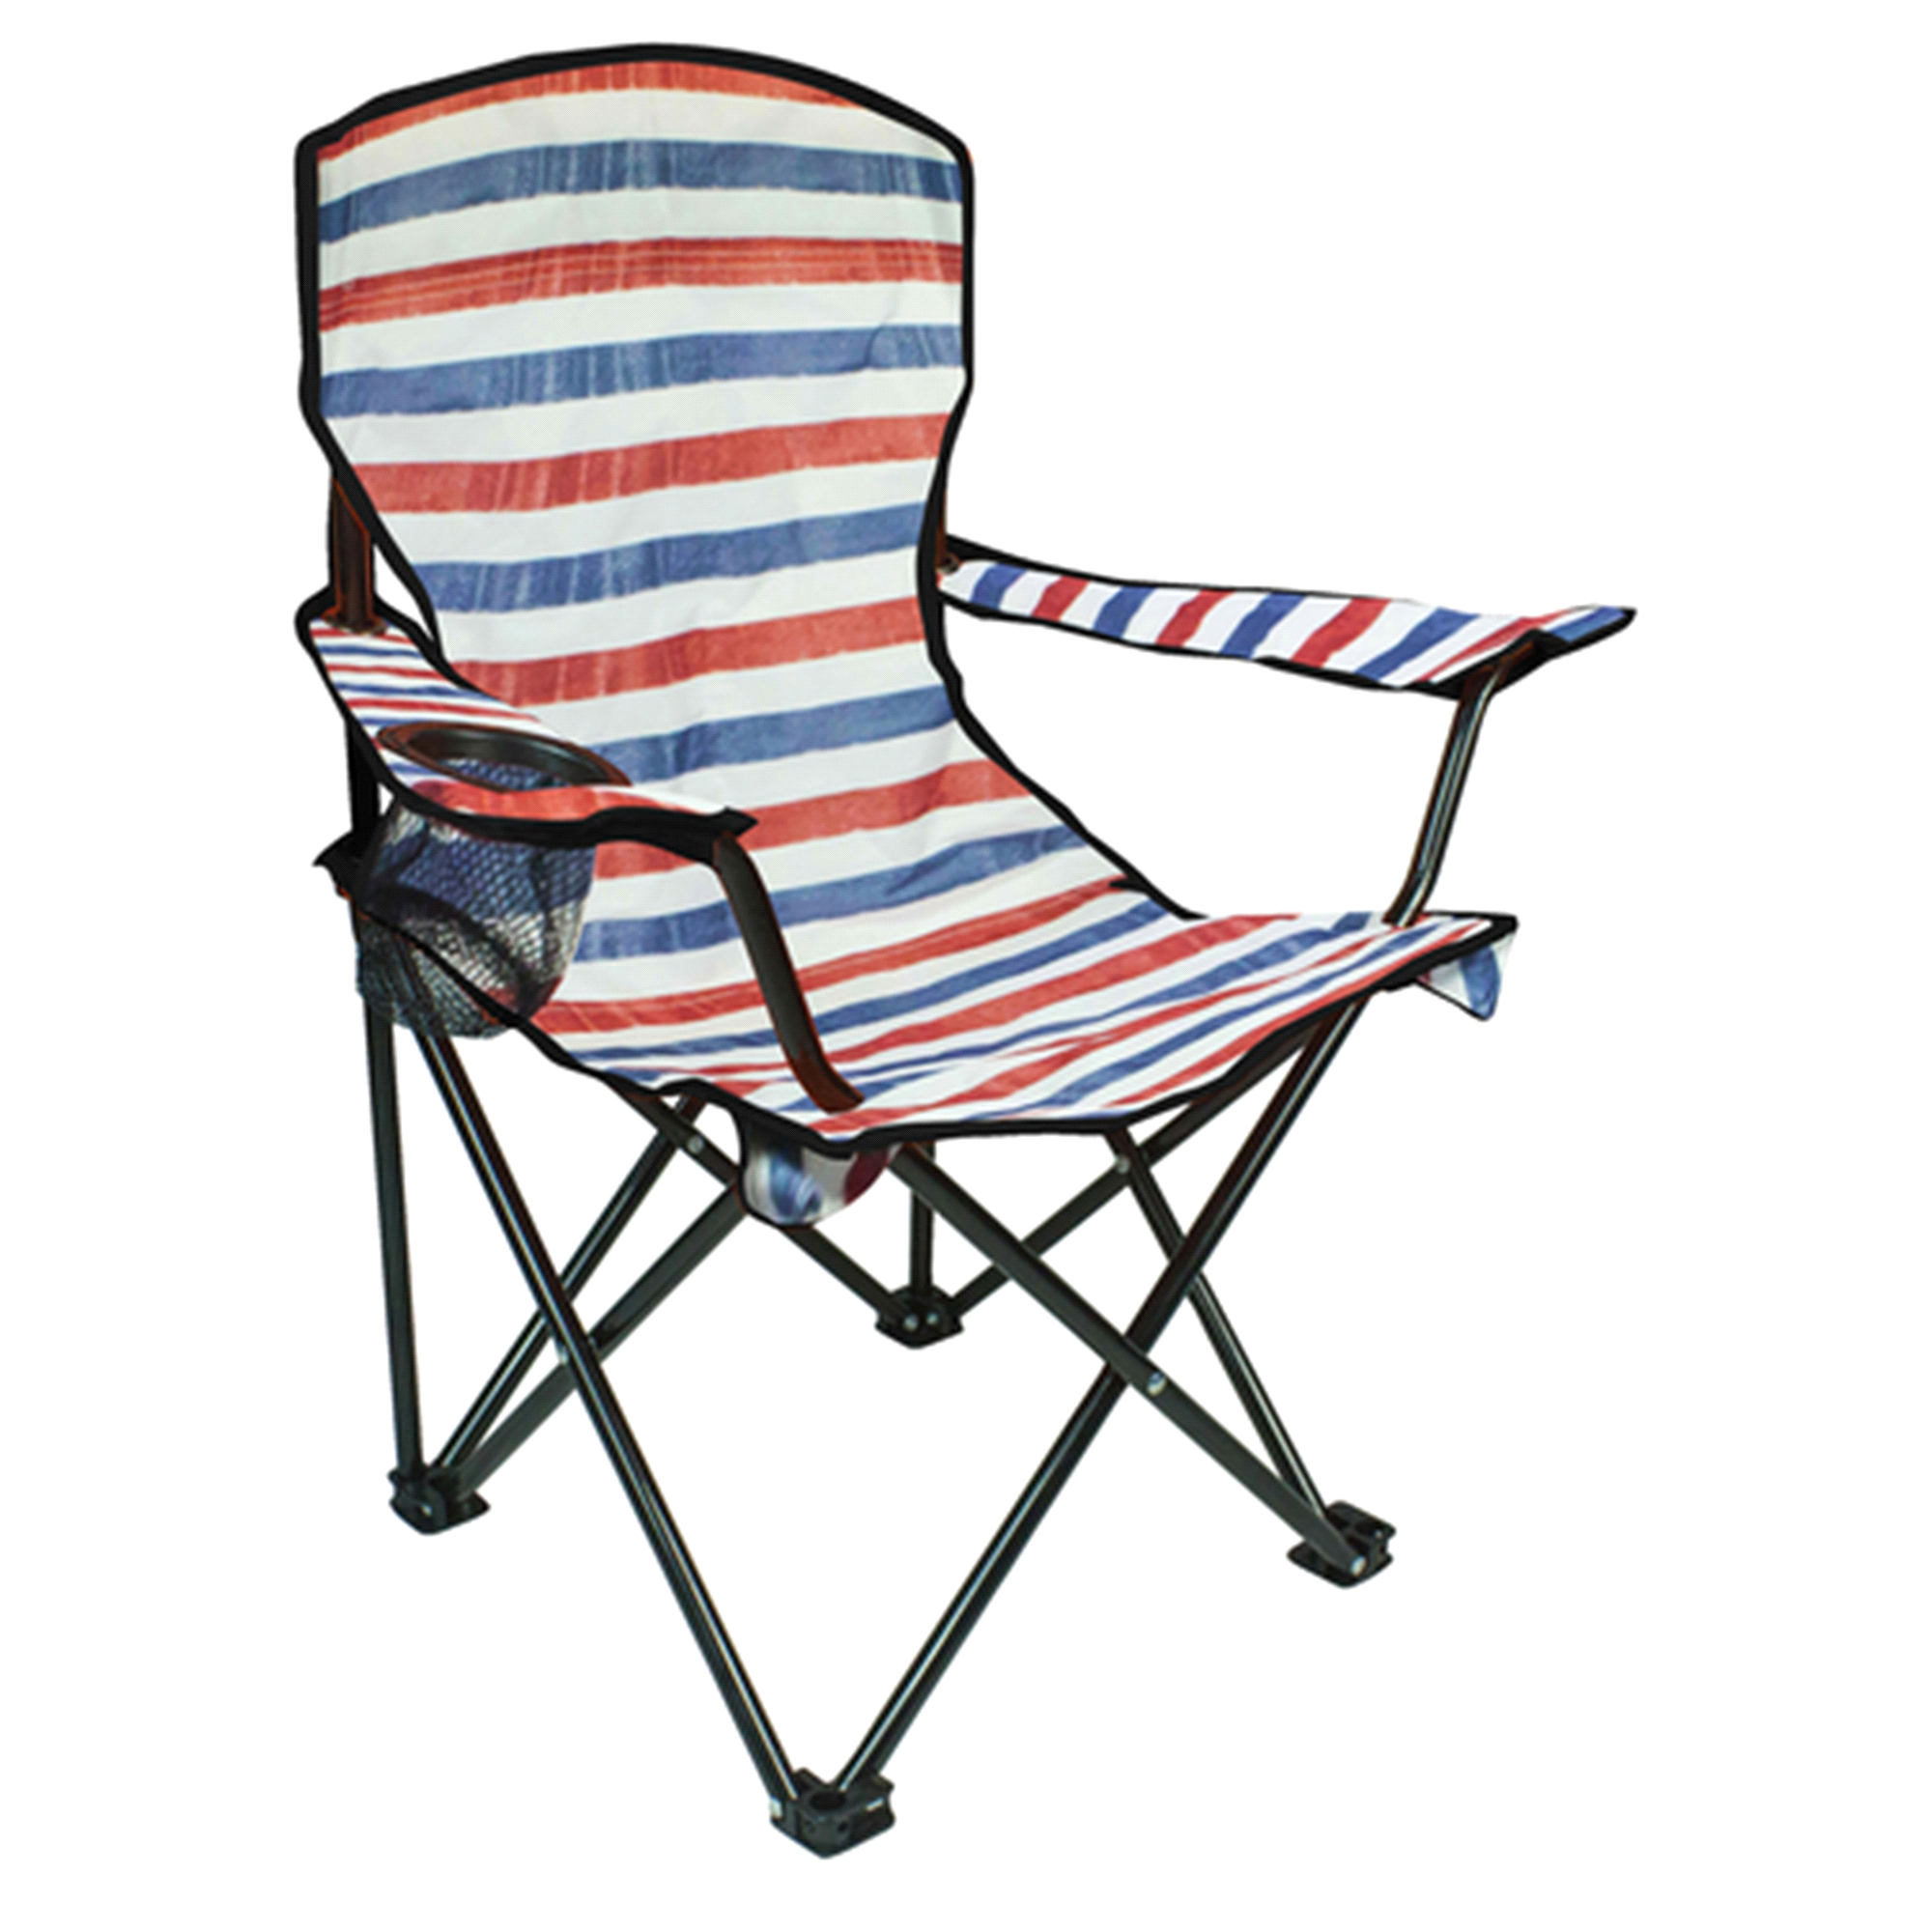 Lake U0026 Trail Junior Tie Dye Chair | Meijer.com